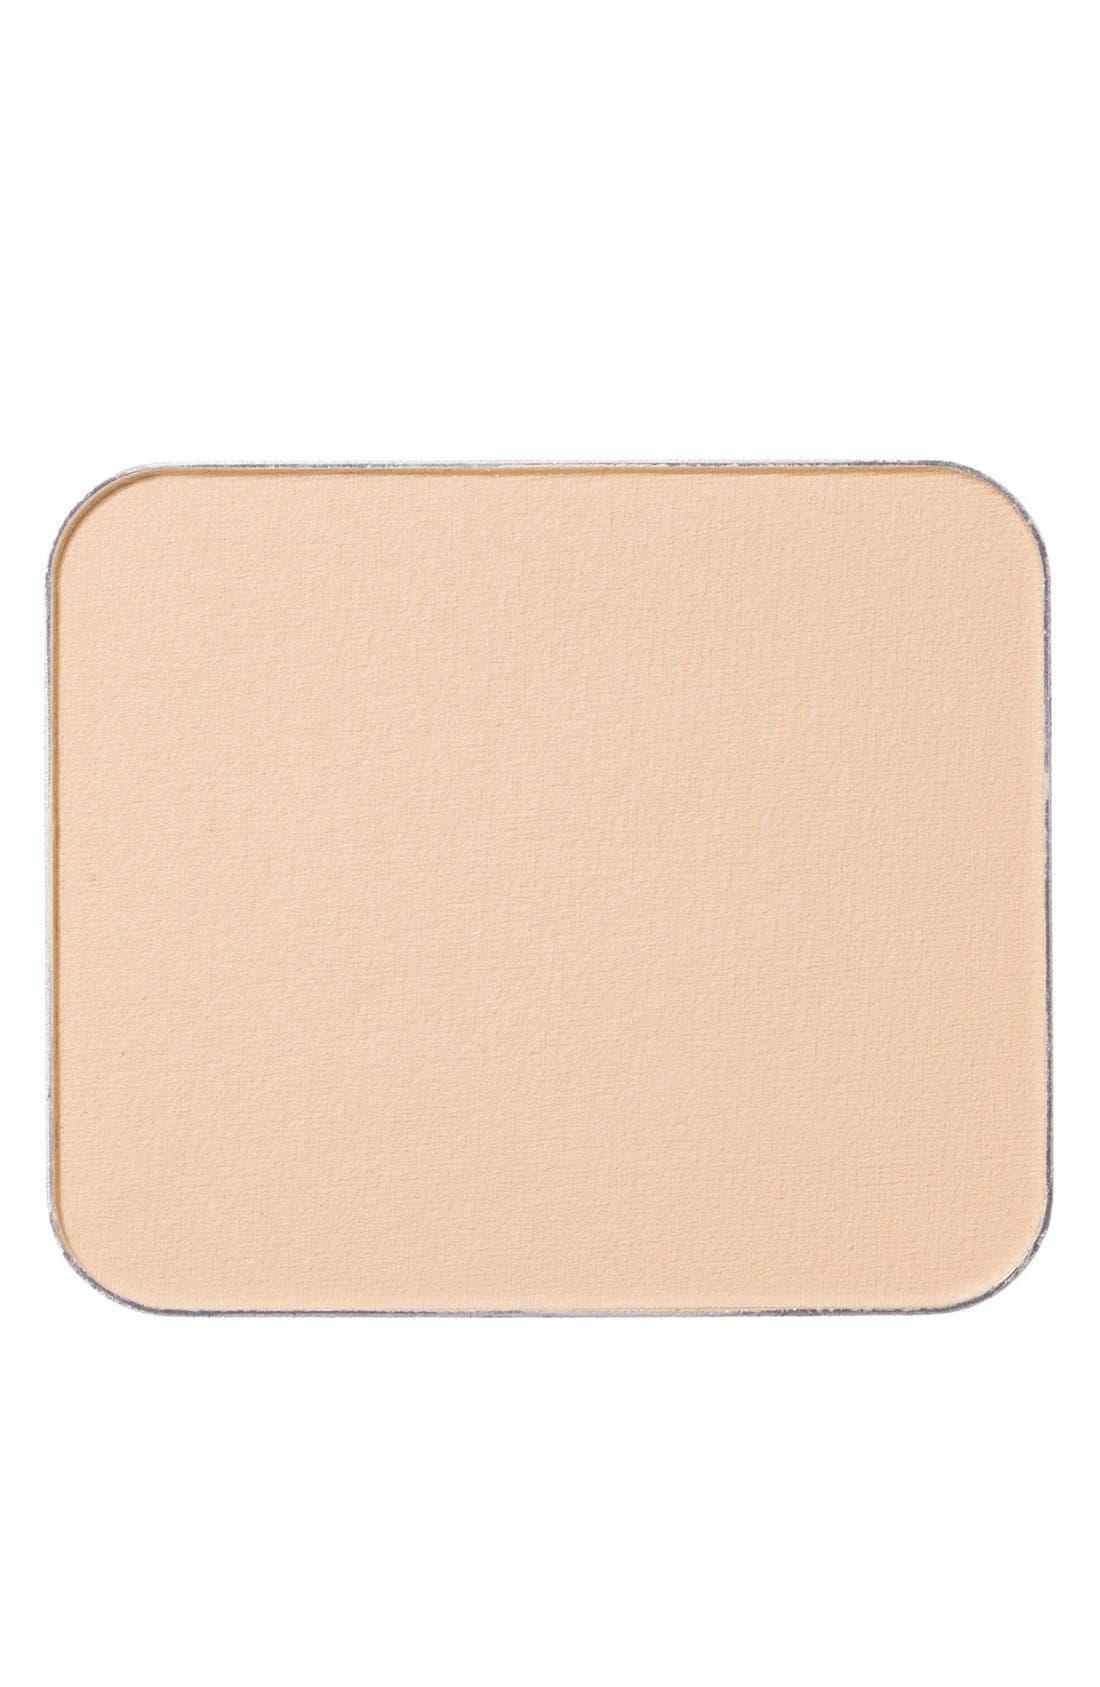 Maifanshi Silky Moisture Powder Compact Refill,                             Main thumbnail 1, color,                             012